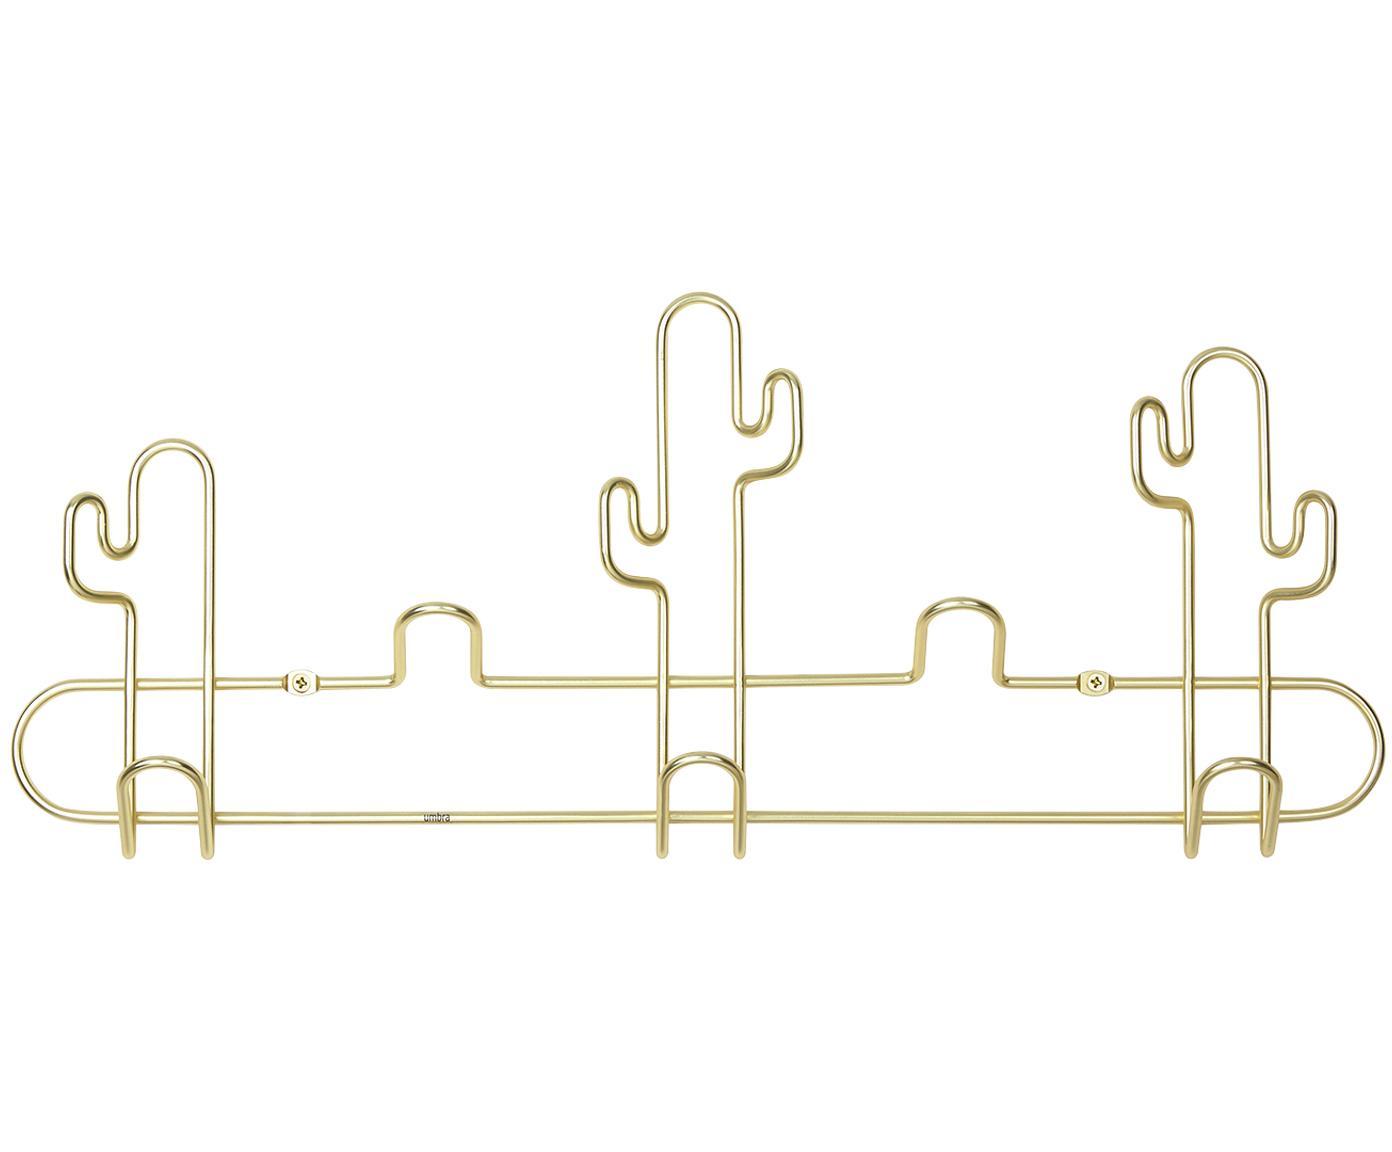 Appendiabiti in metallo Desert, Metallo  verniciato, Ottone, Larg. 43 x Alt. 18 cm